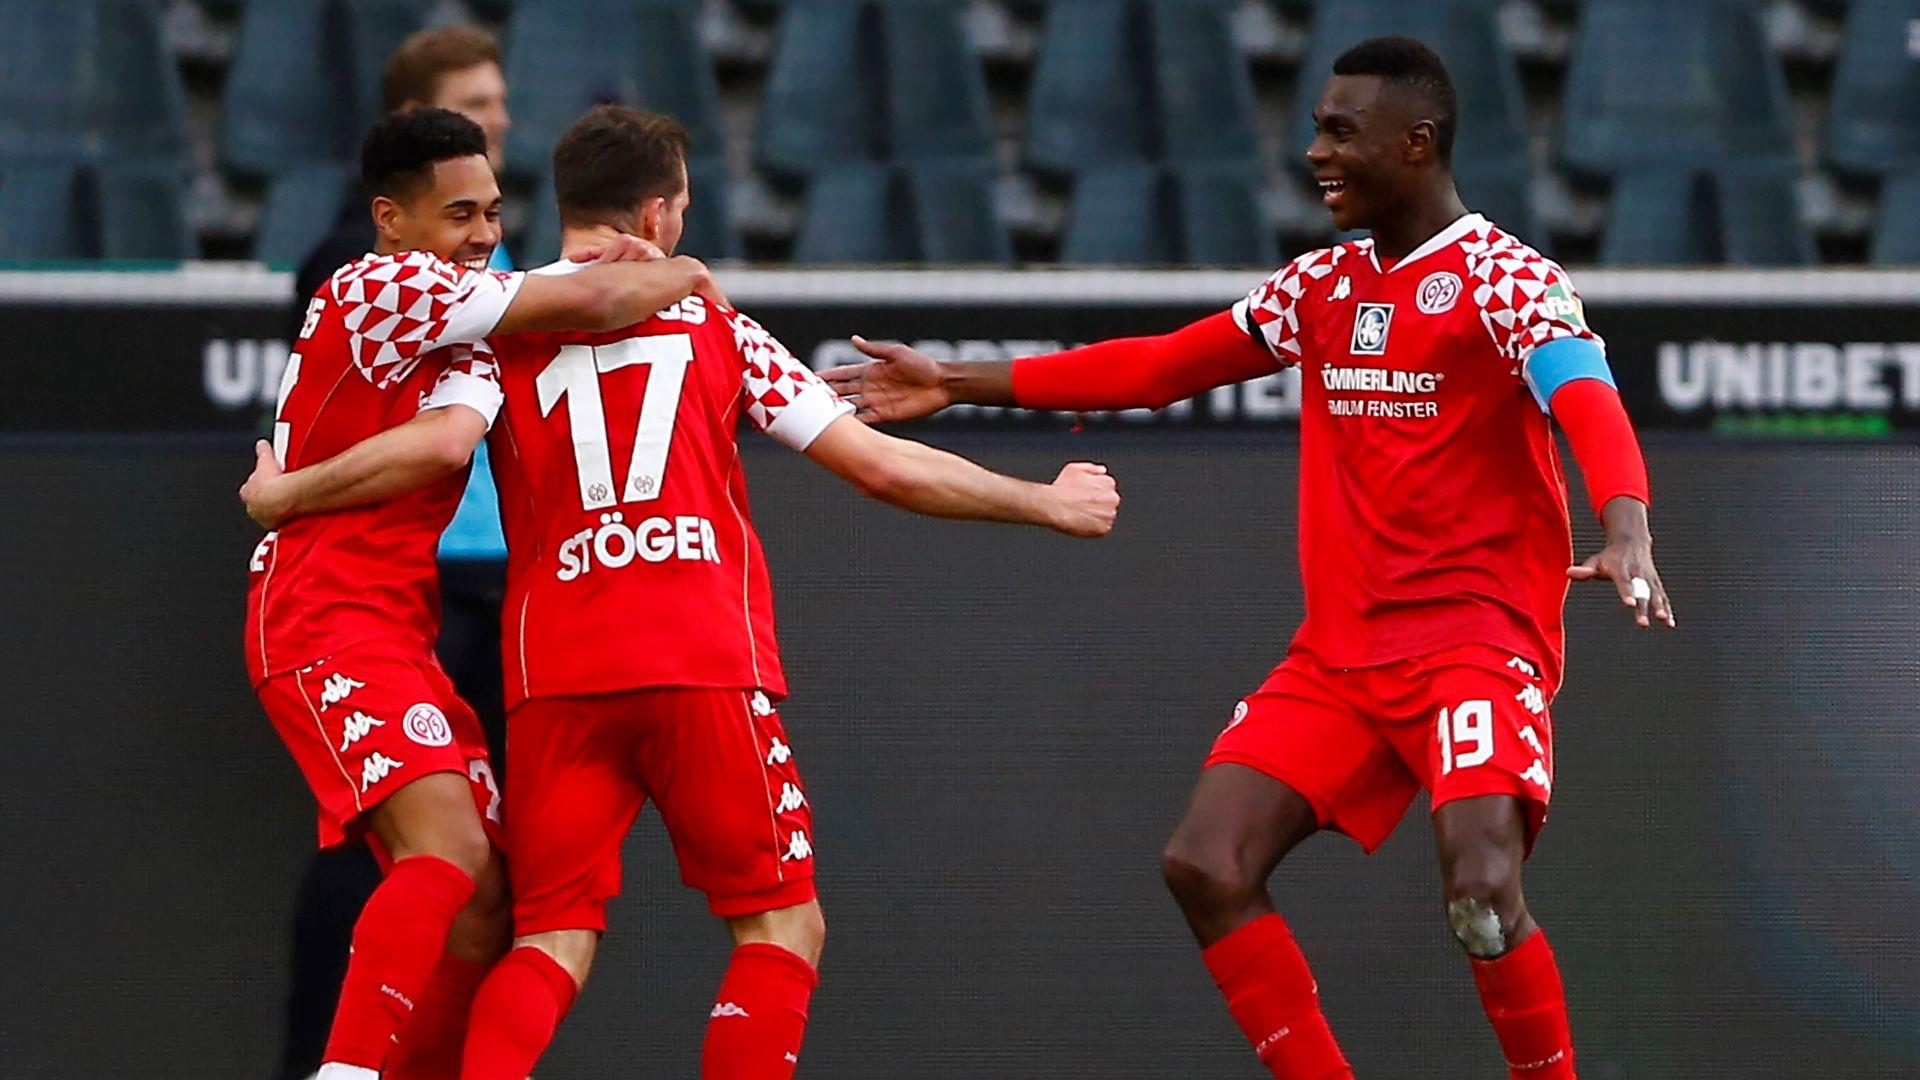 FC Schalke 04 Mainz 05 Bundesliga Freitag Stöger Livestream